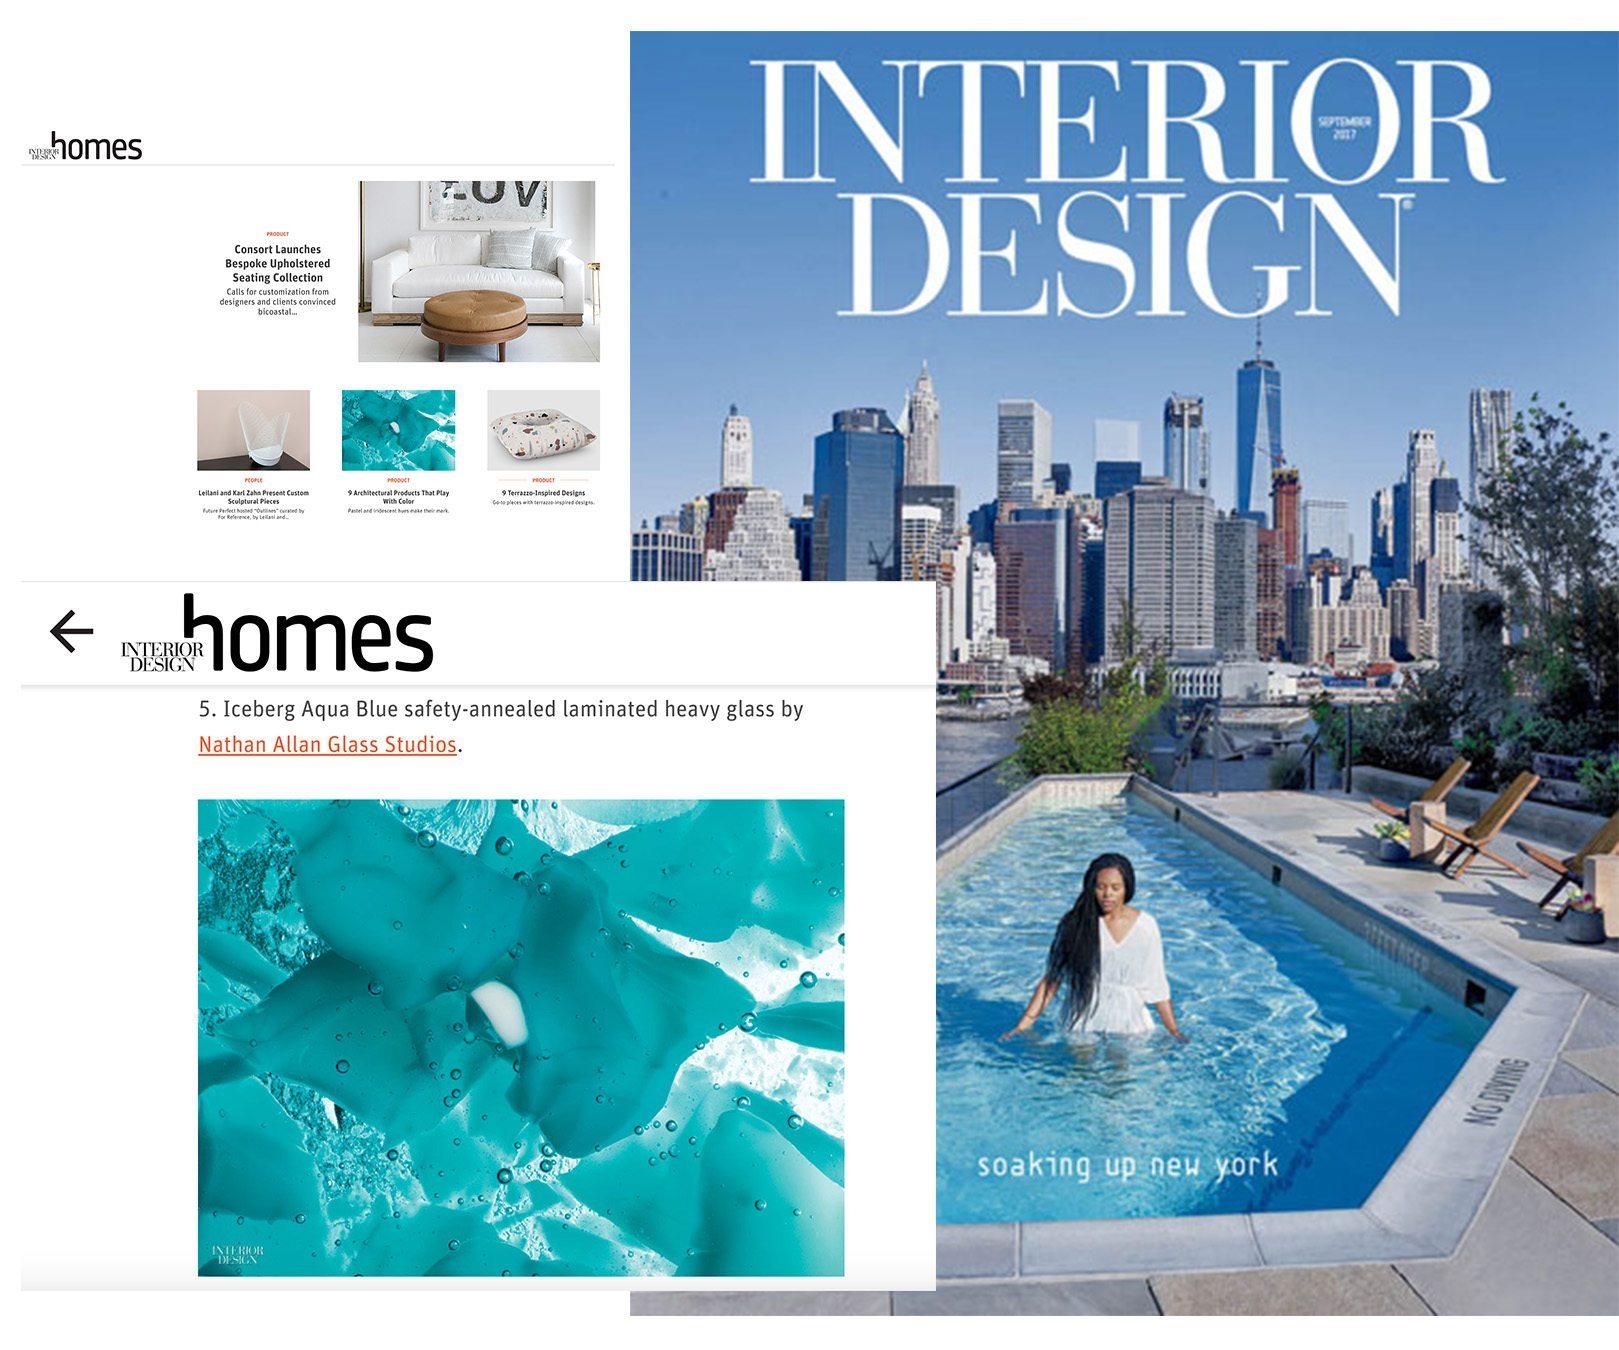 Interior Design Magazine Iceberg Glass